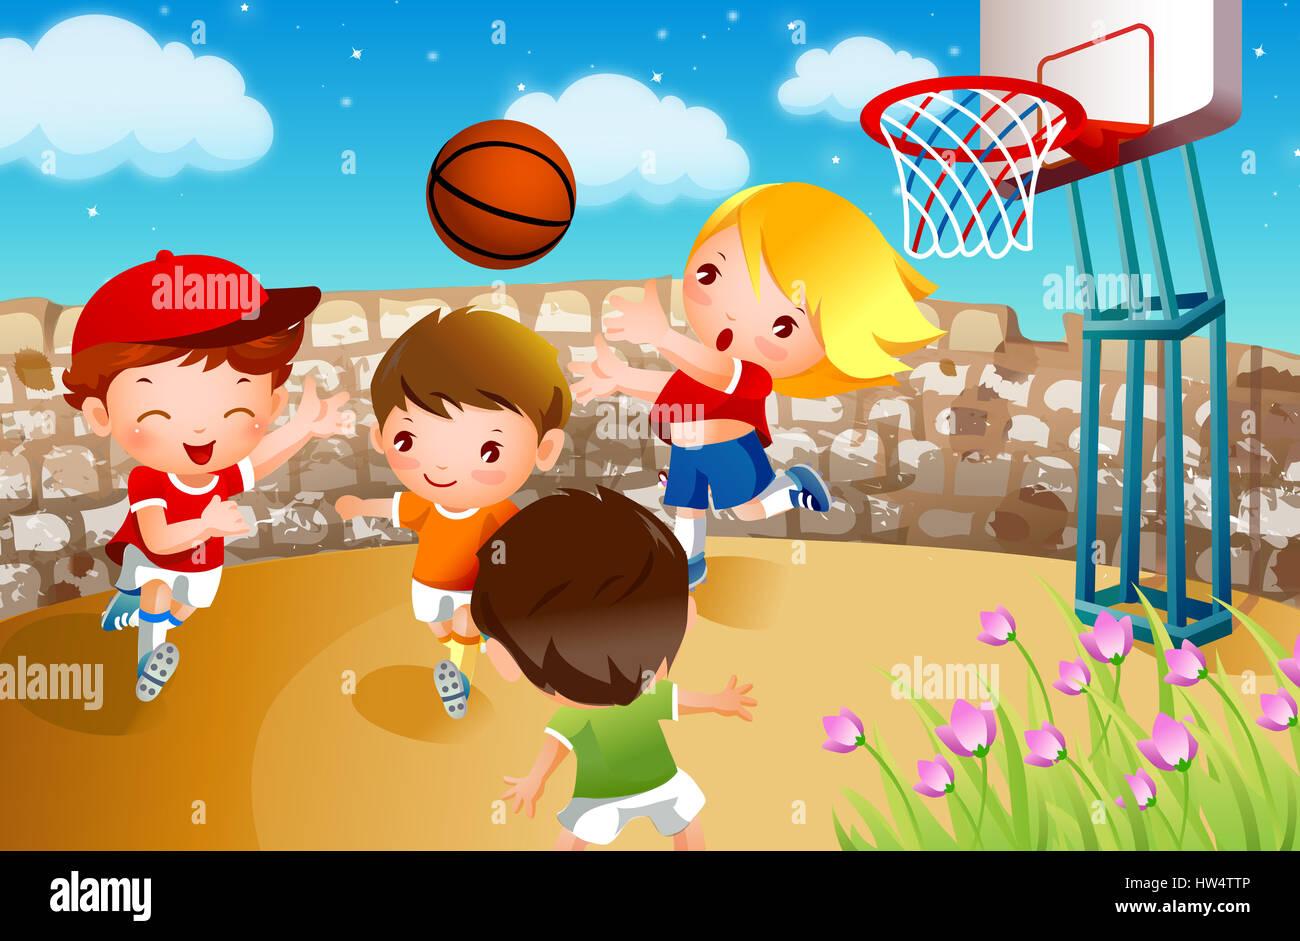 Free Orange Basketball Cliparts, Download Free Clip Art, Free Clip Art on  Clipart Library